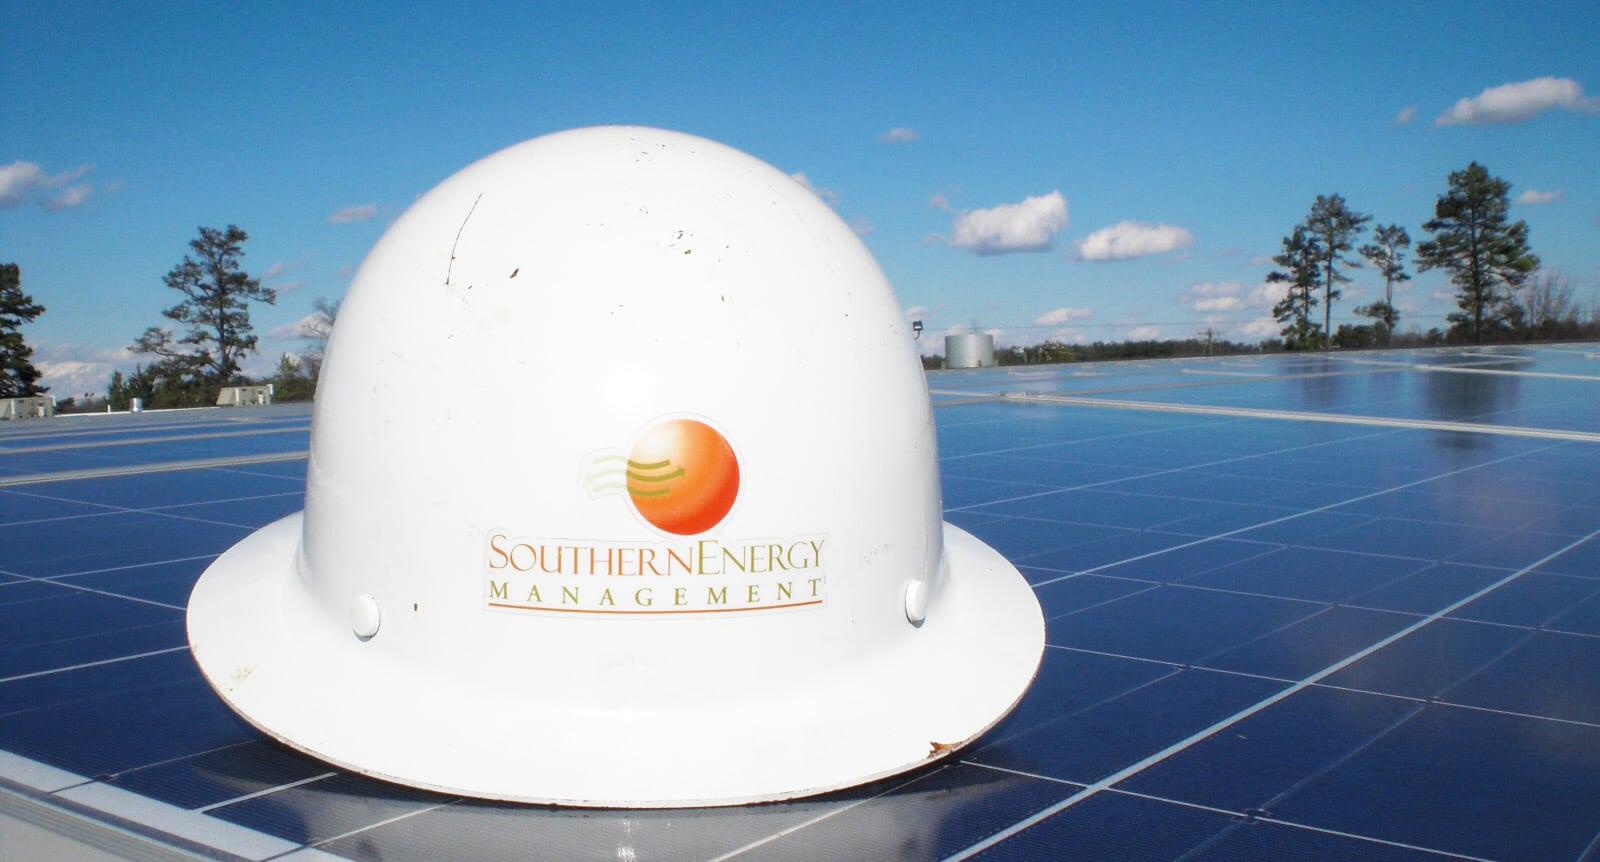 Southern Energy Management hardhat on solar panel